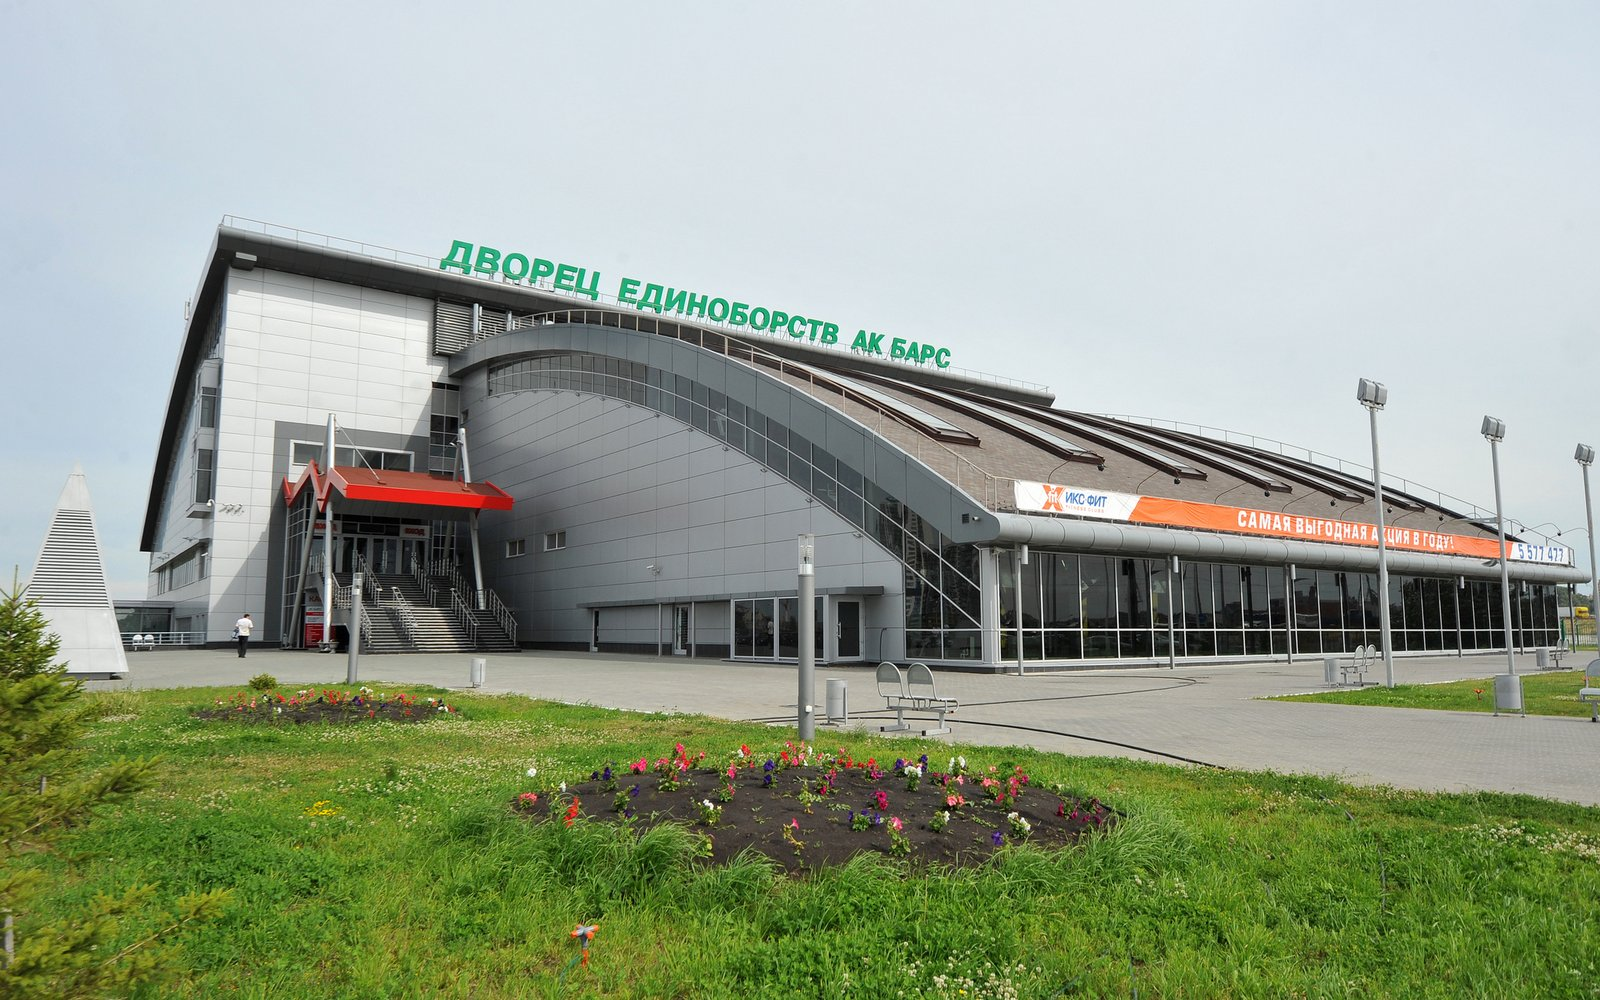 Ak Bars martial arts arena Kazan, Russia